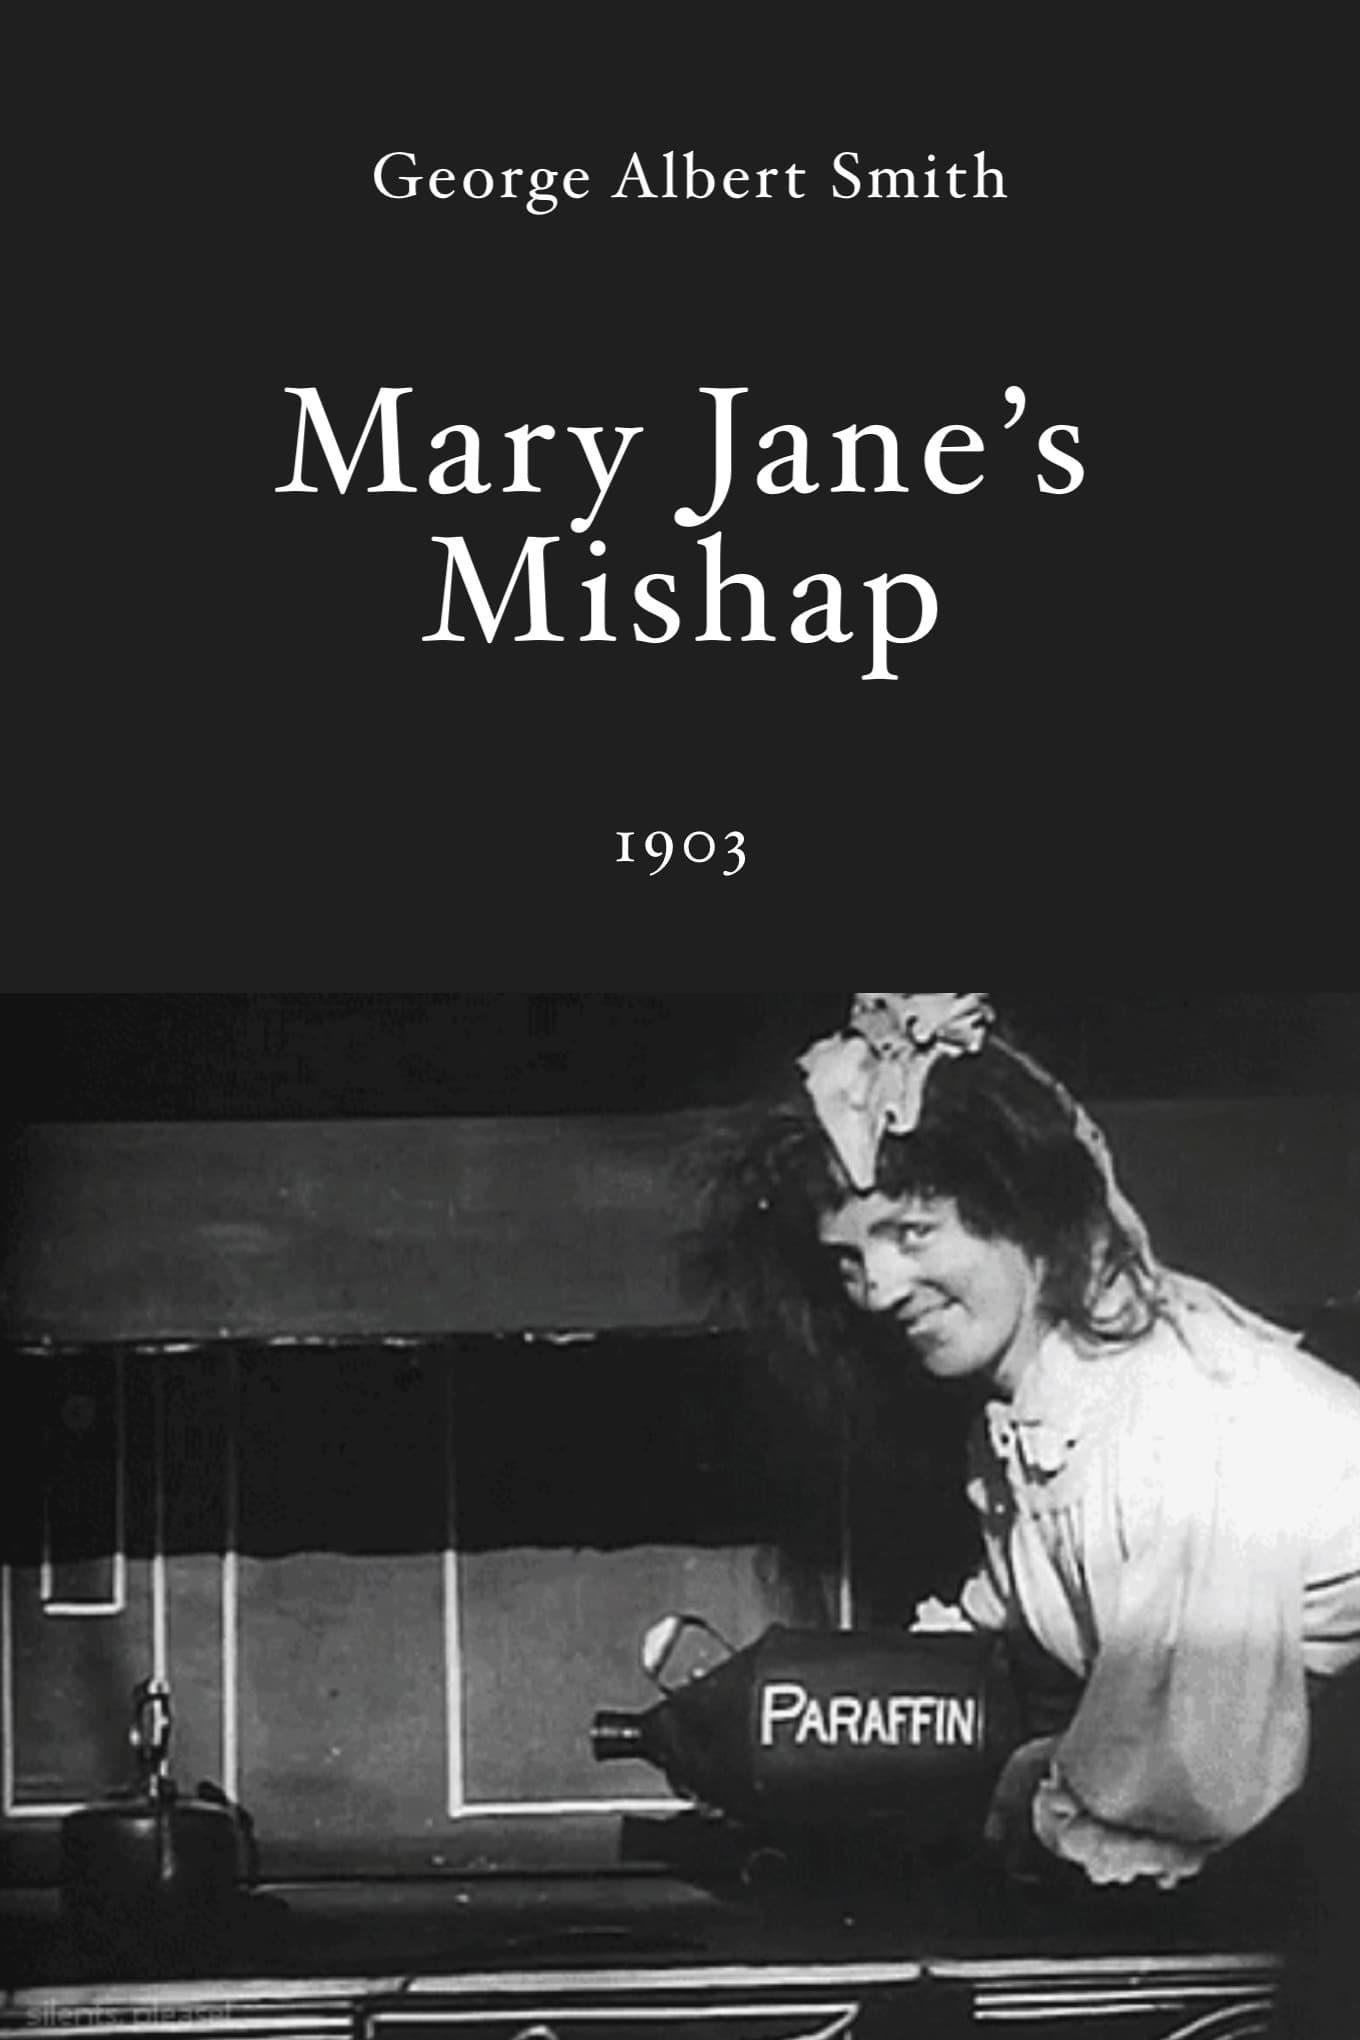 Mary Jane's Mishap